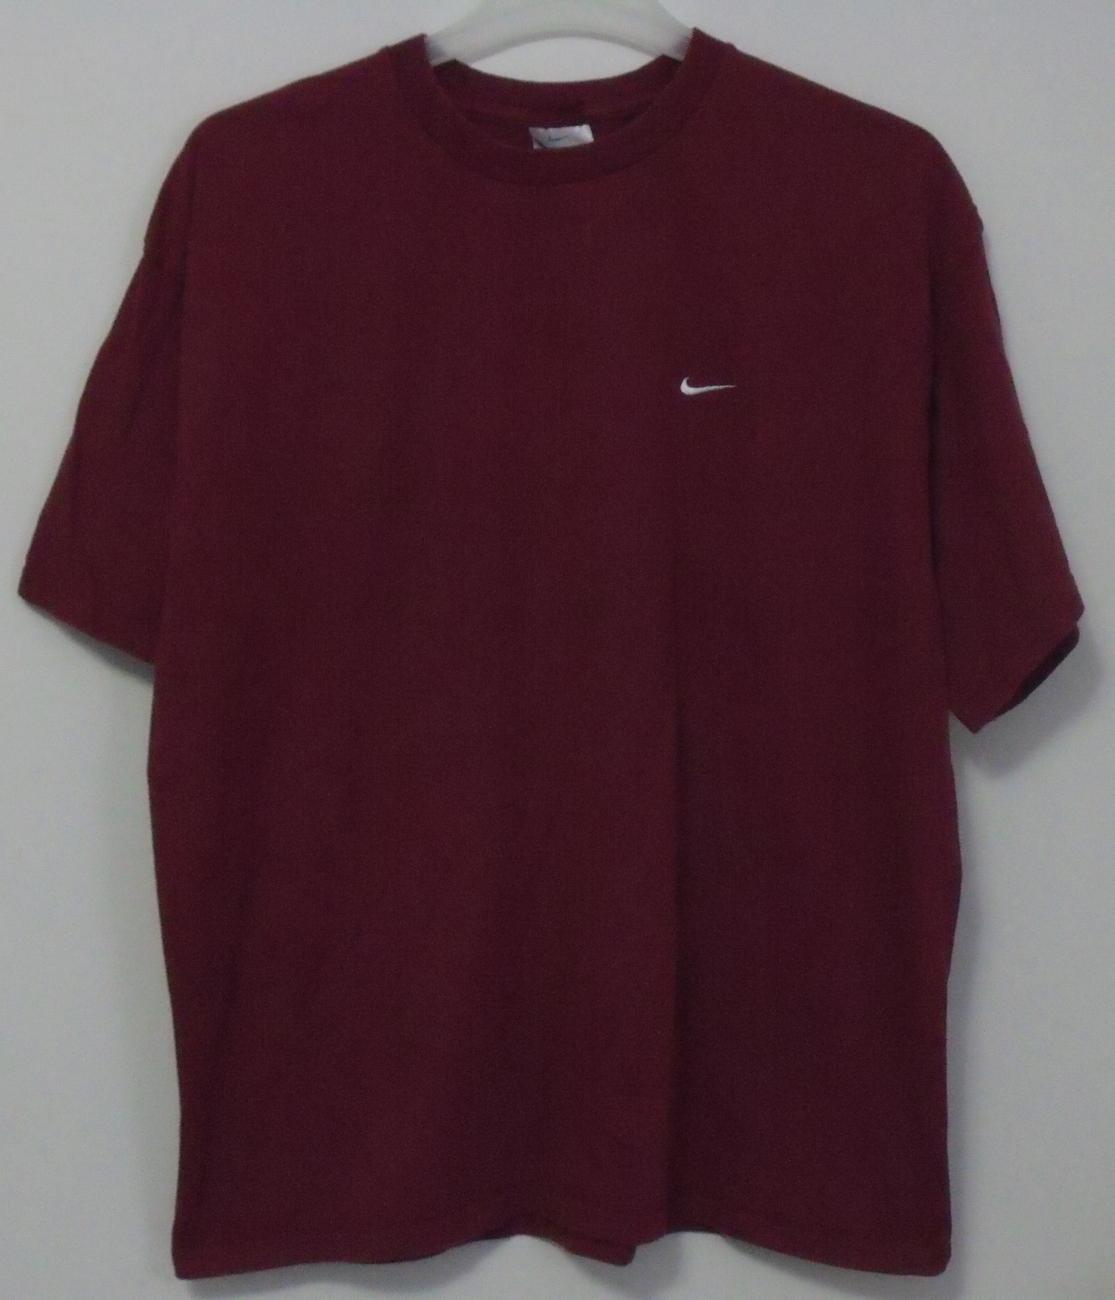 Mens Nike Maroon Short Sleeve T Shirt Size XL Nike